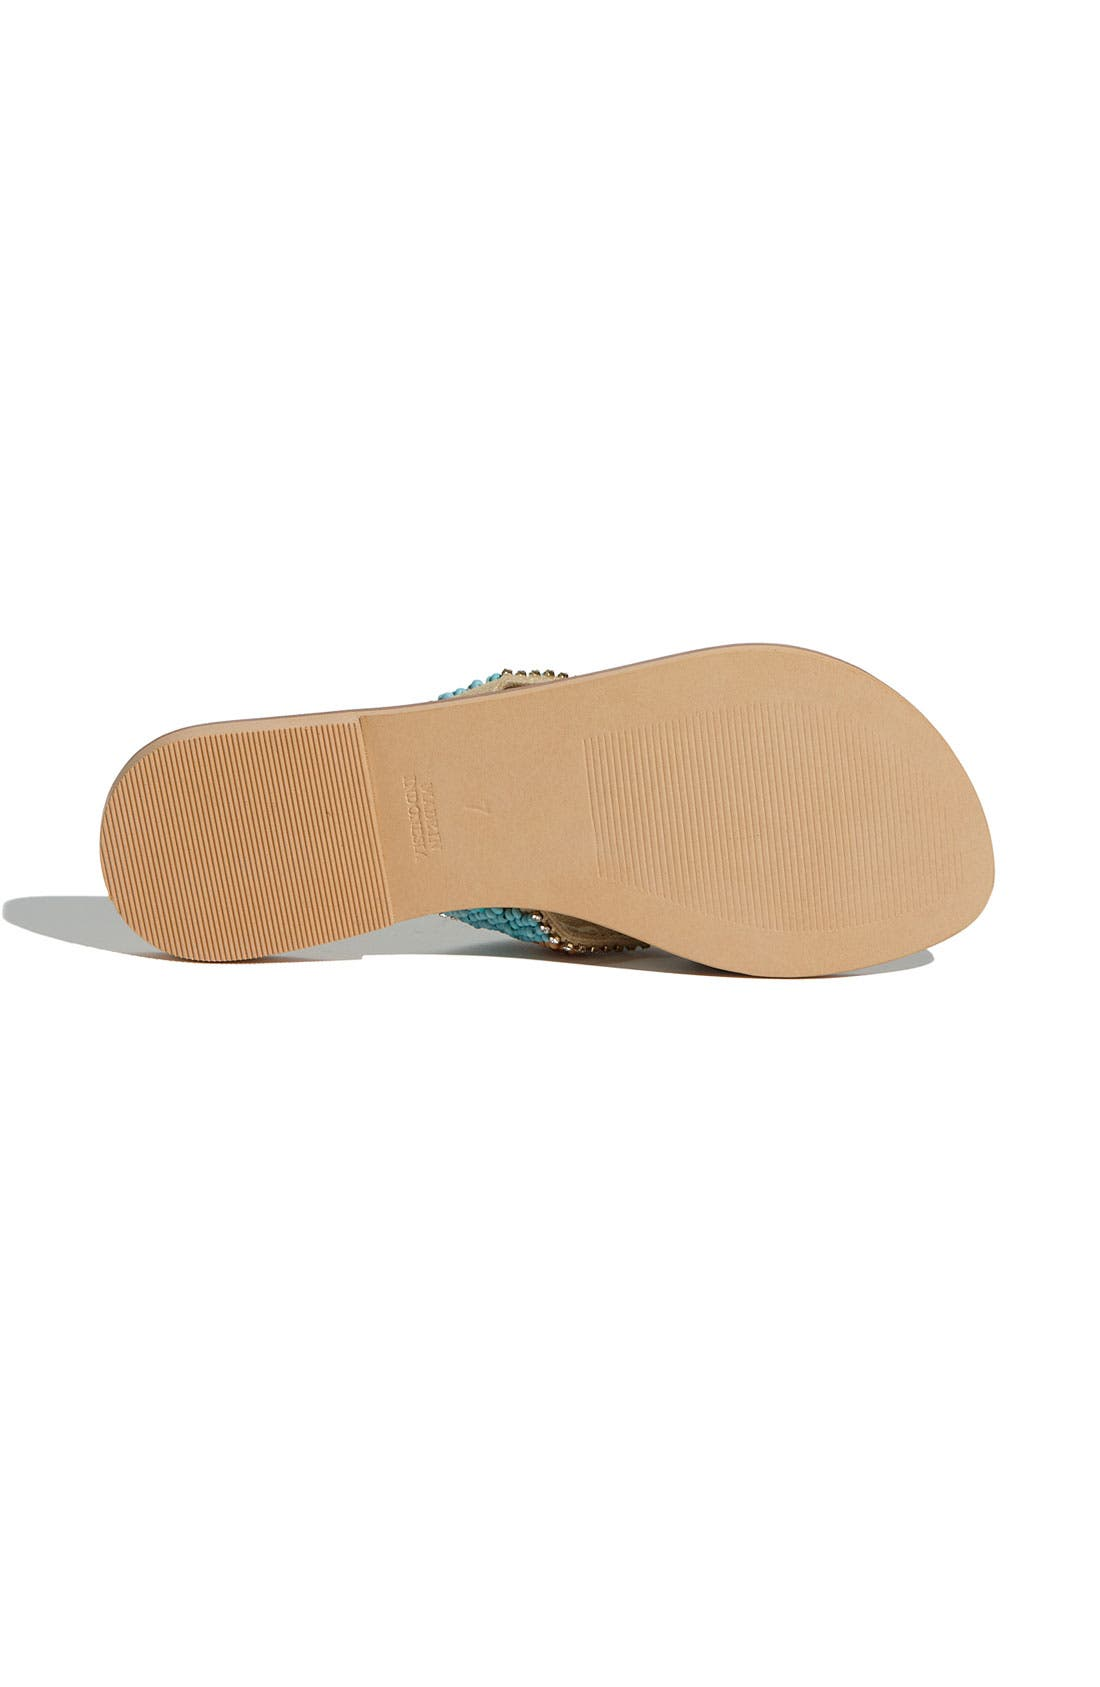 Alternate Image 4  - Skemo 'Jenny' Thong Sandal